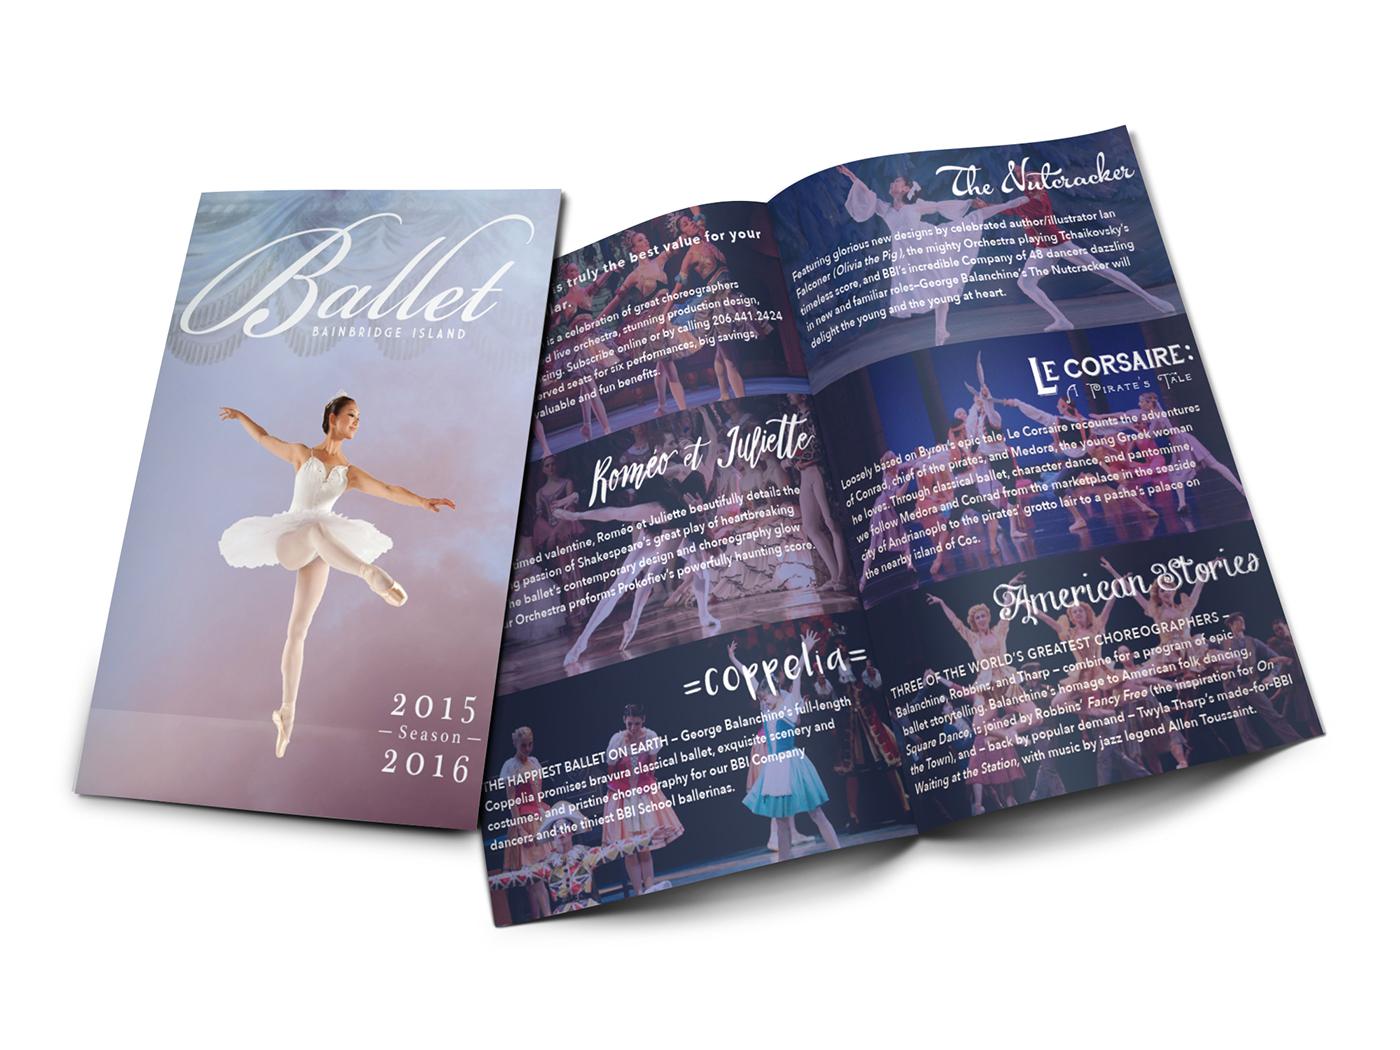 Balet Bainbridge Island. bbi balletbi 8-panel 8 panel brochure Brand Design brand identity m. holsinger monica holsinger monica holsinger